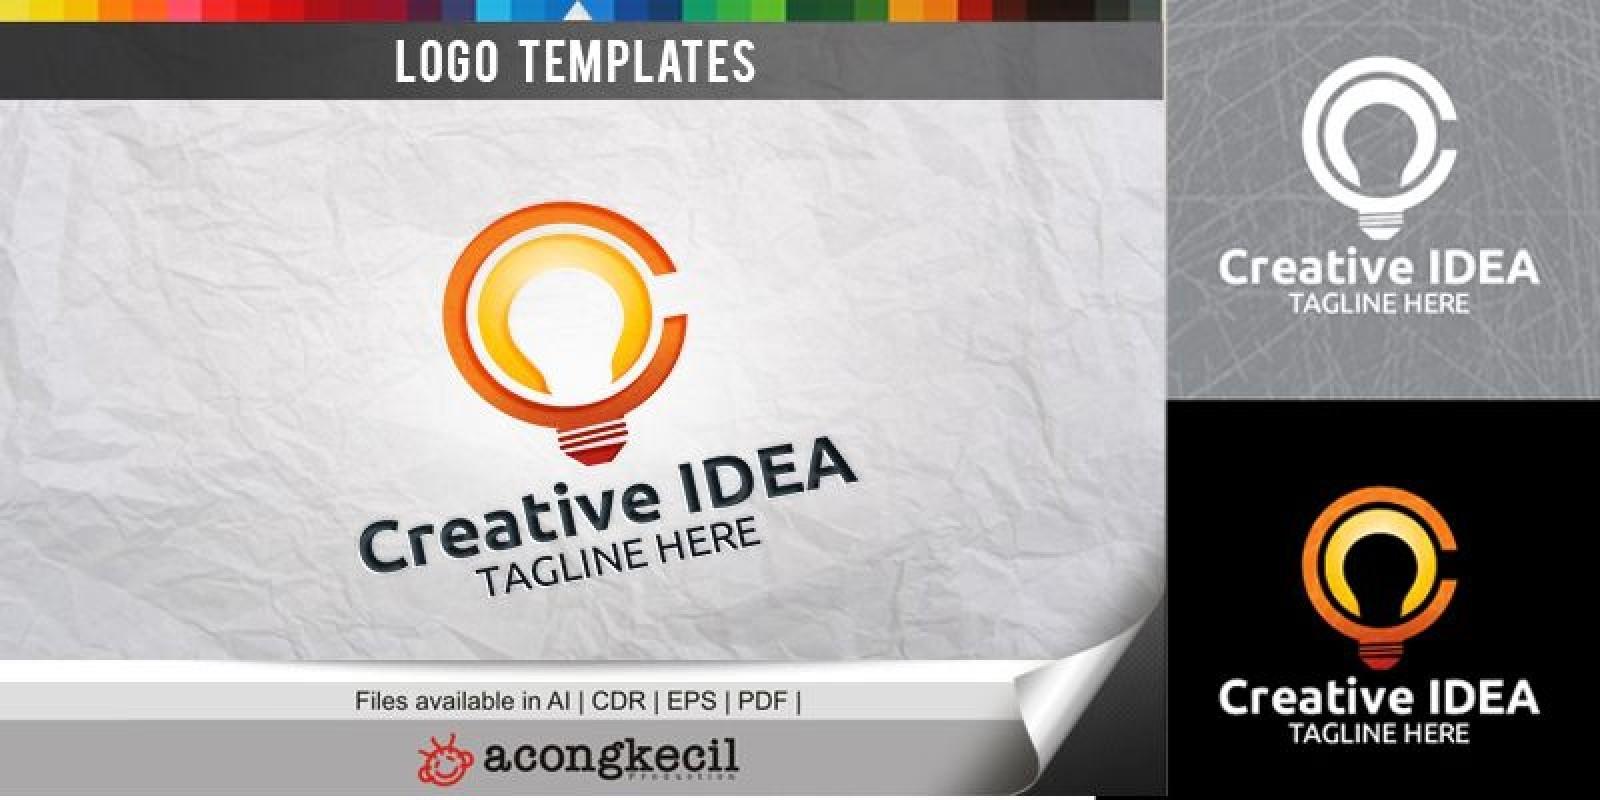 Creative Idea - Logo Template